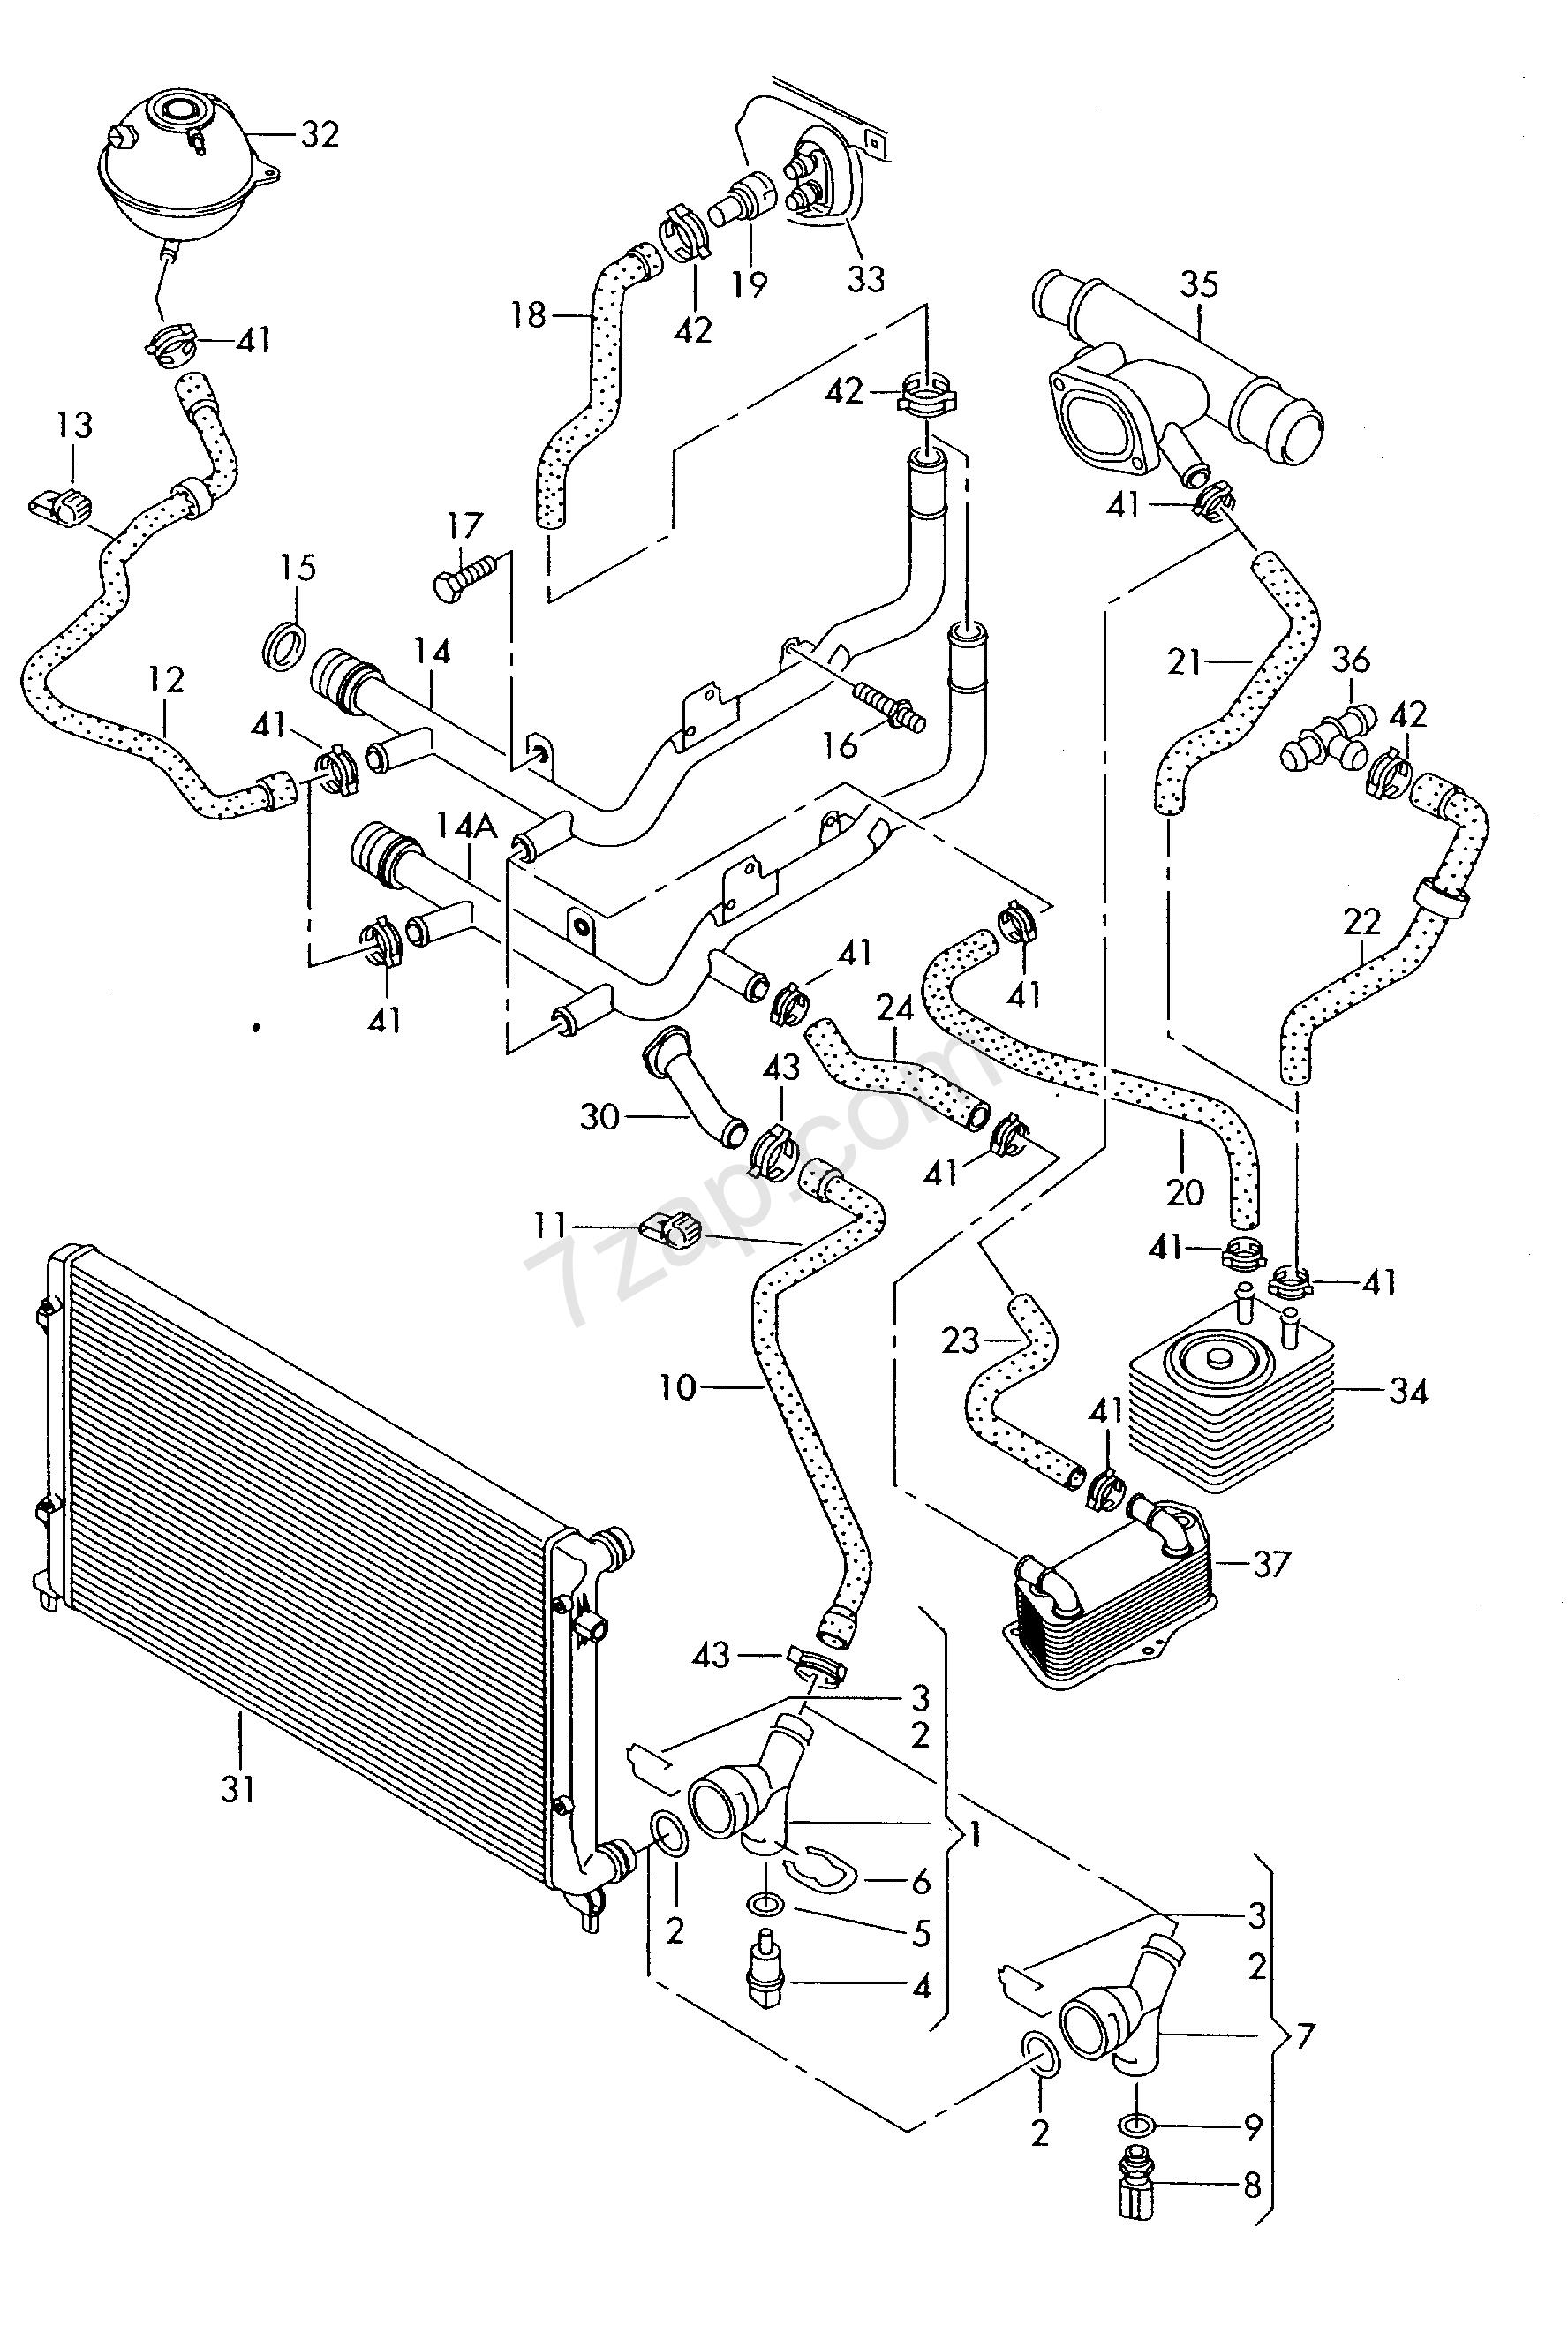 Strange Audi Engine Cooling Diagram Wiring Library Wiring Cloud Staixaidewilluminateatxorg